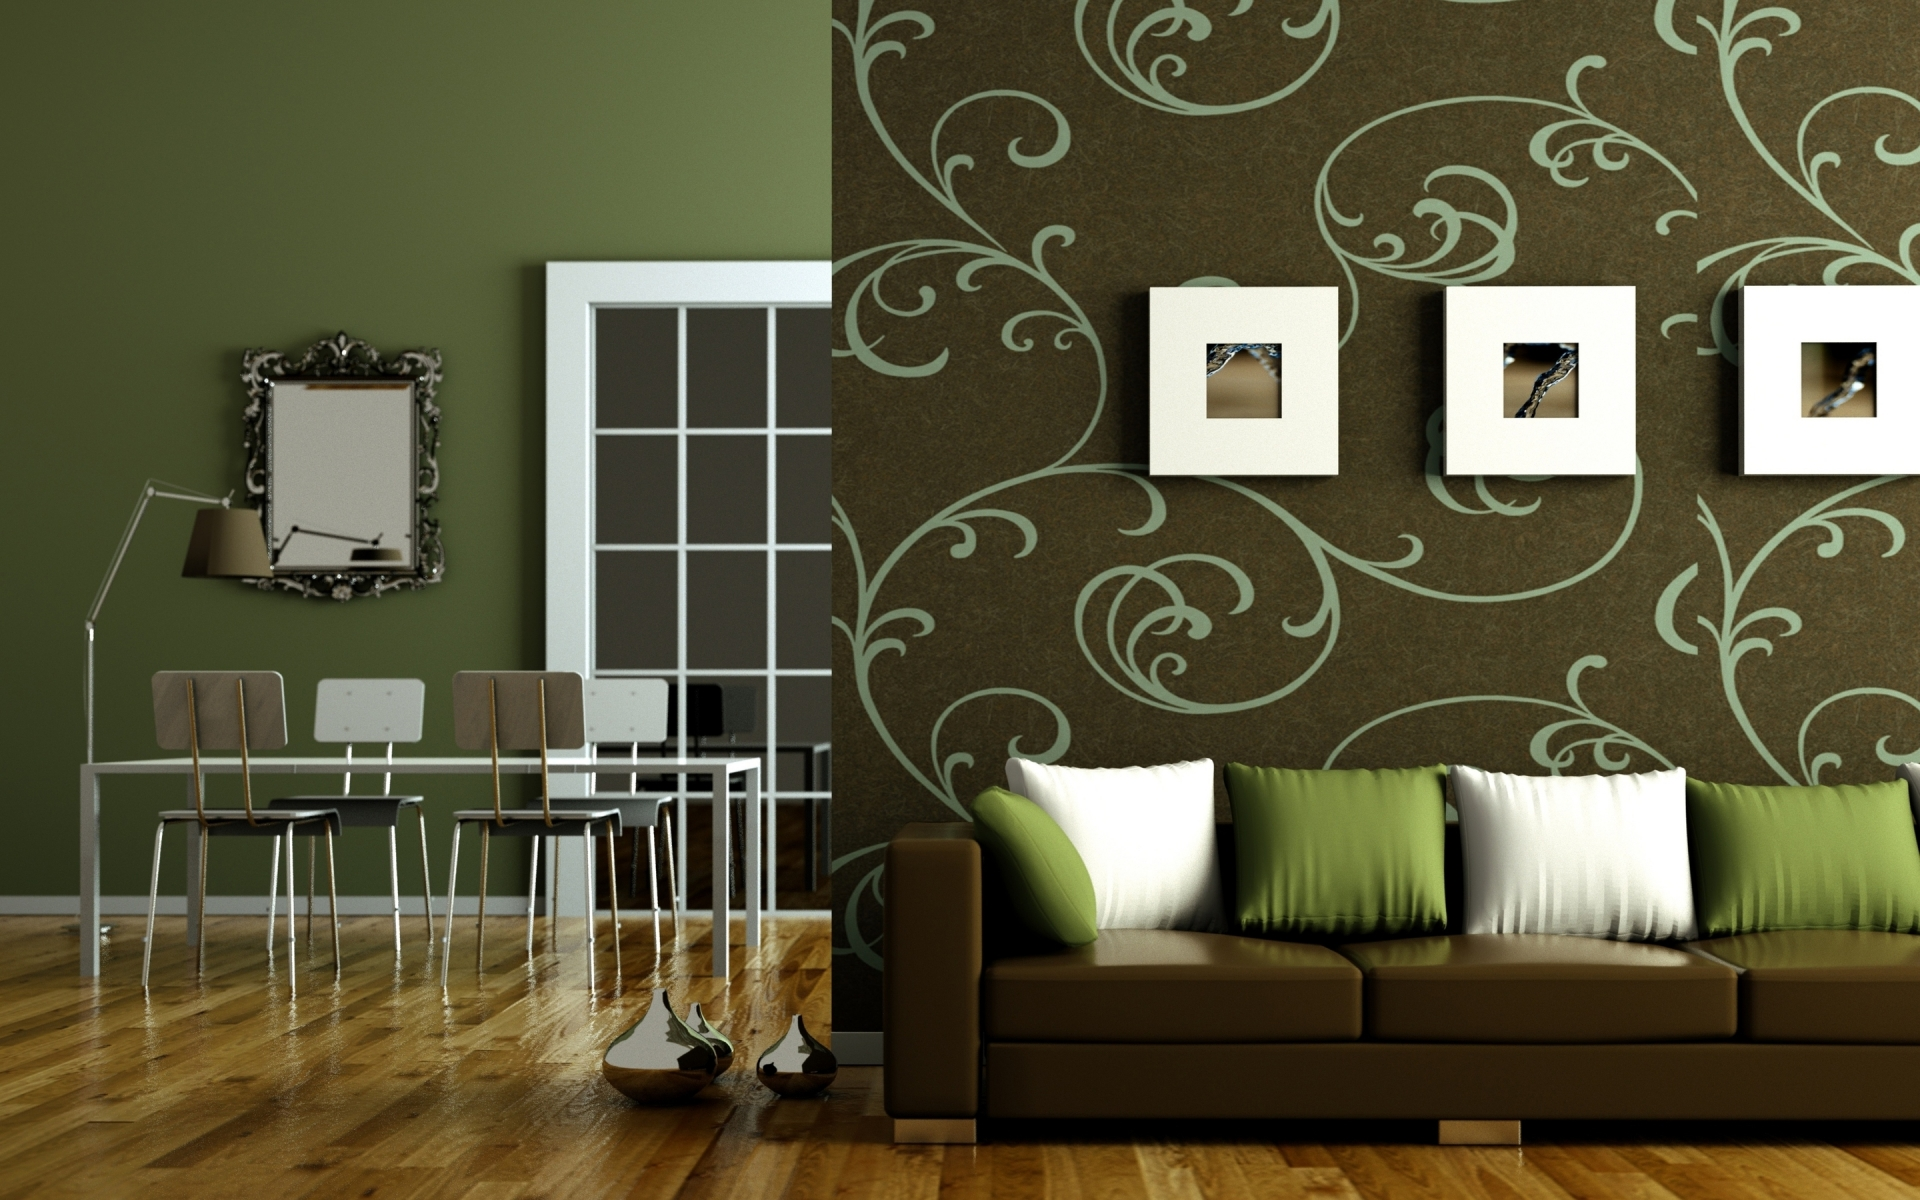 Free download Heres 40 interior design ideas as desktop ...